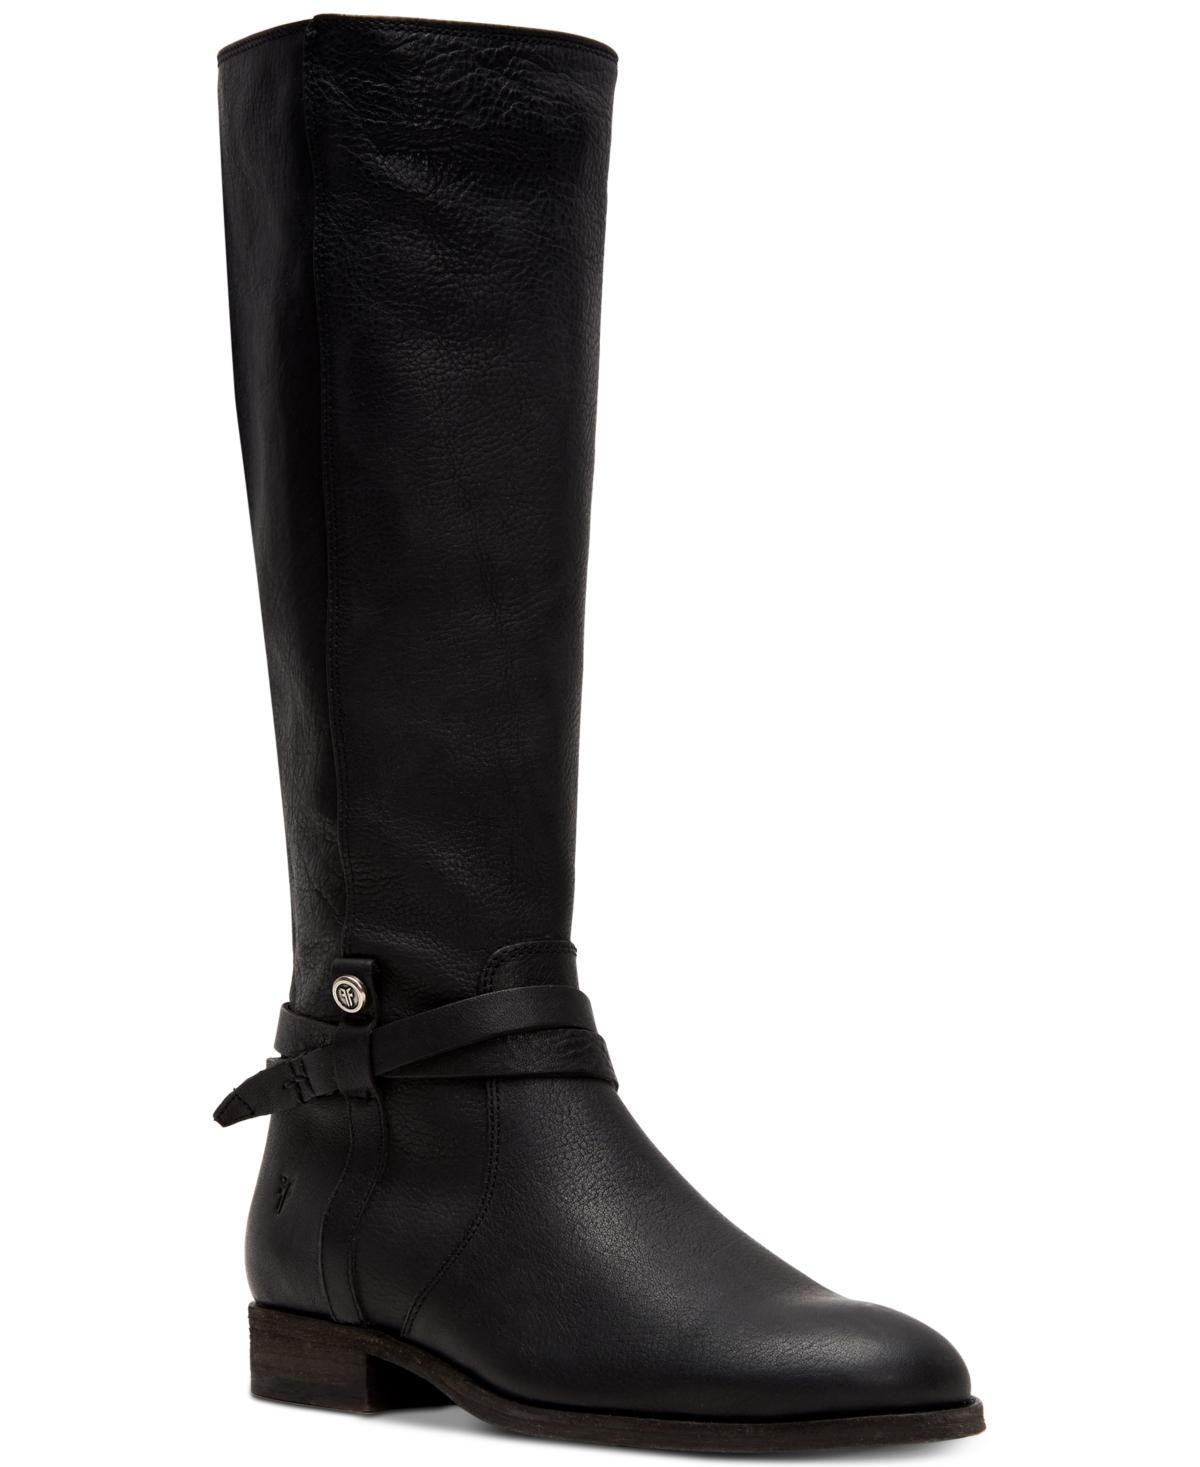 Frye Women's Melissa Riding Leather Boots Women's Shoes